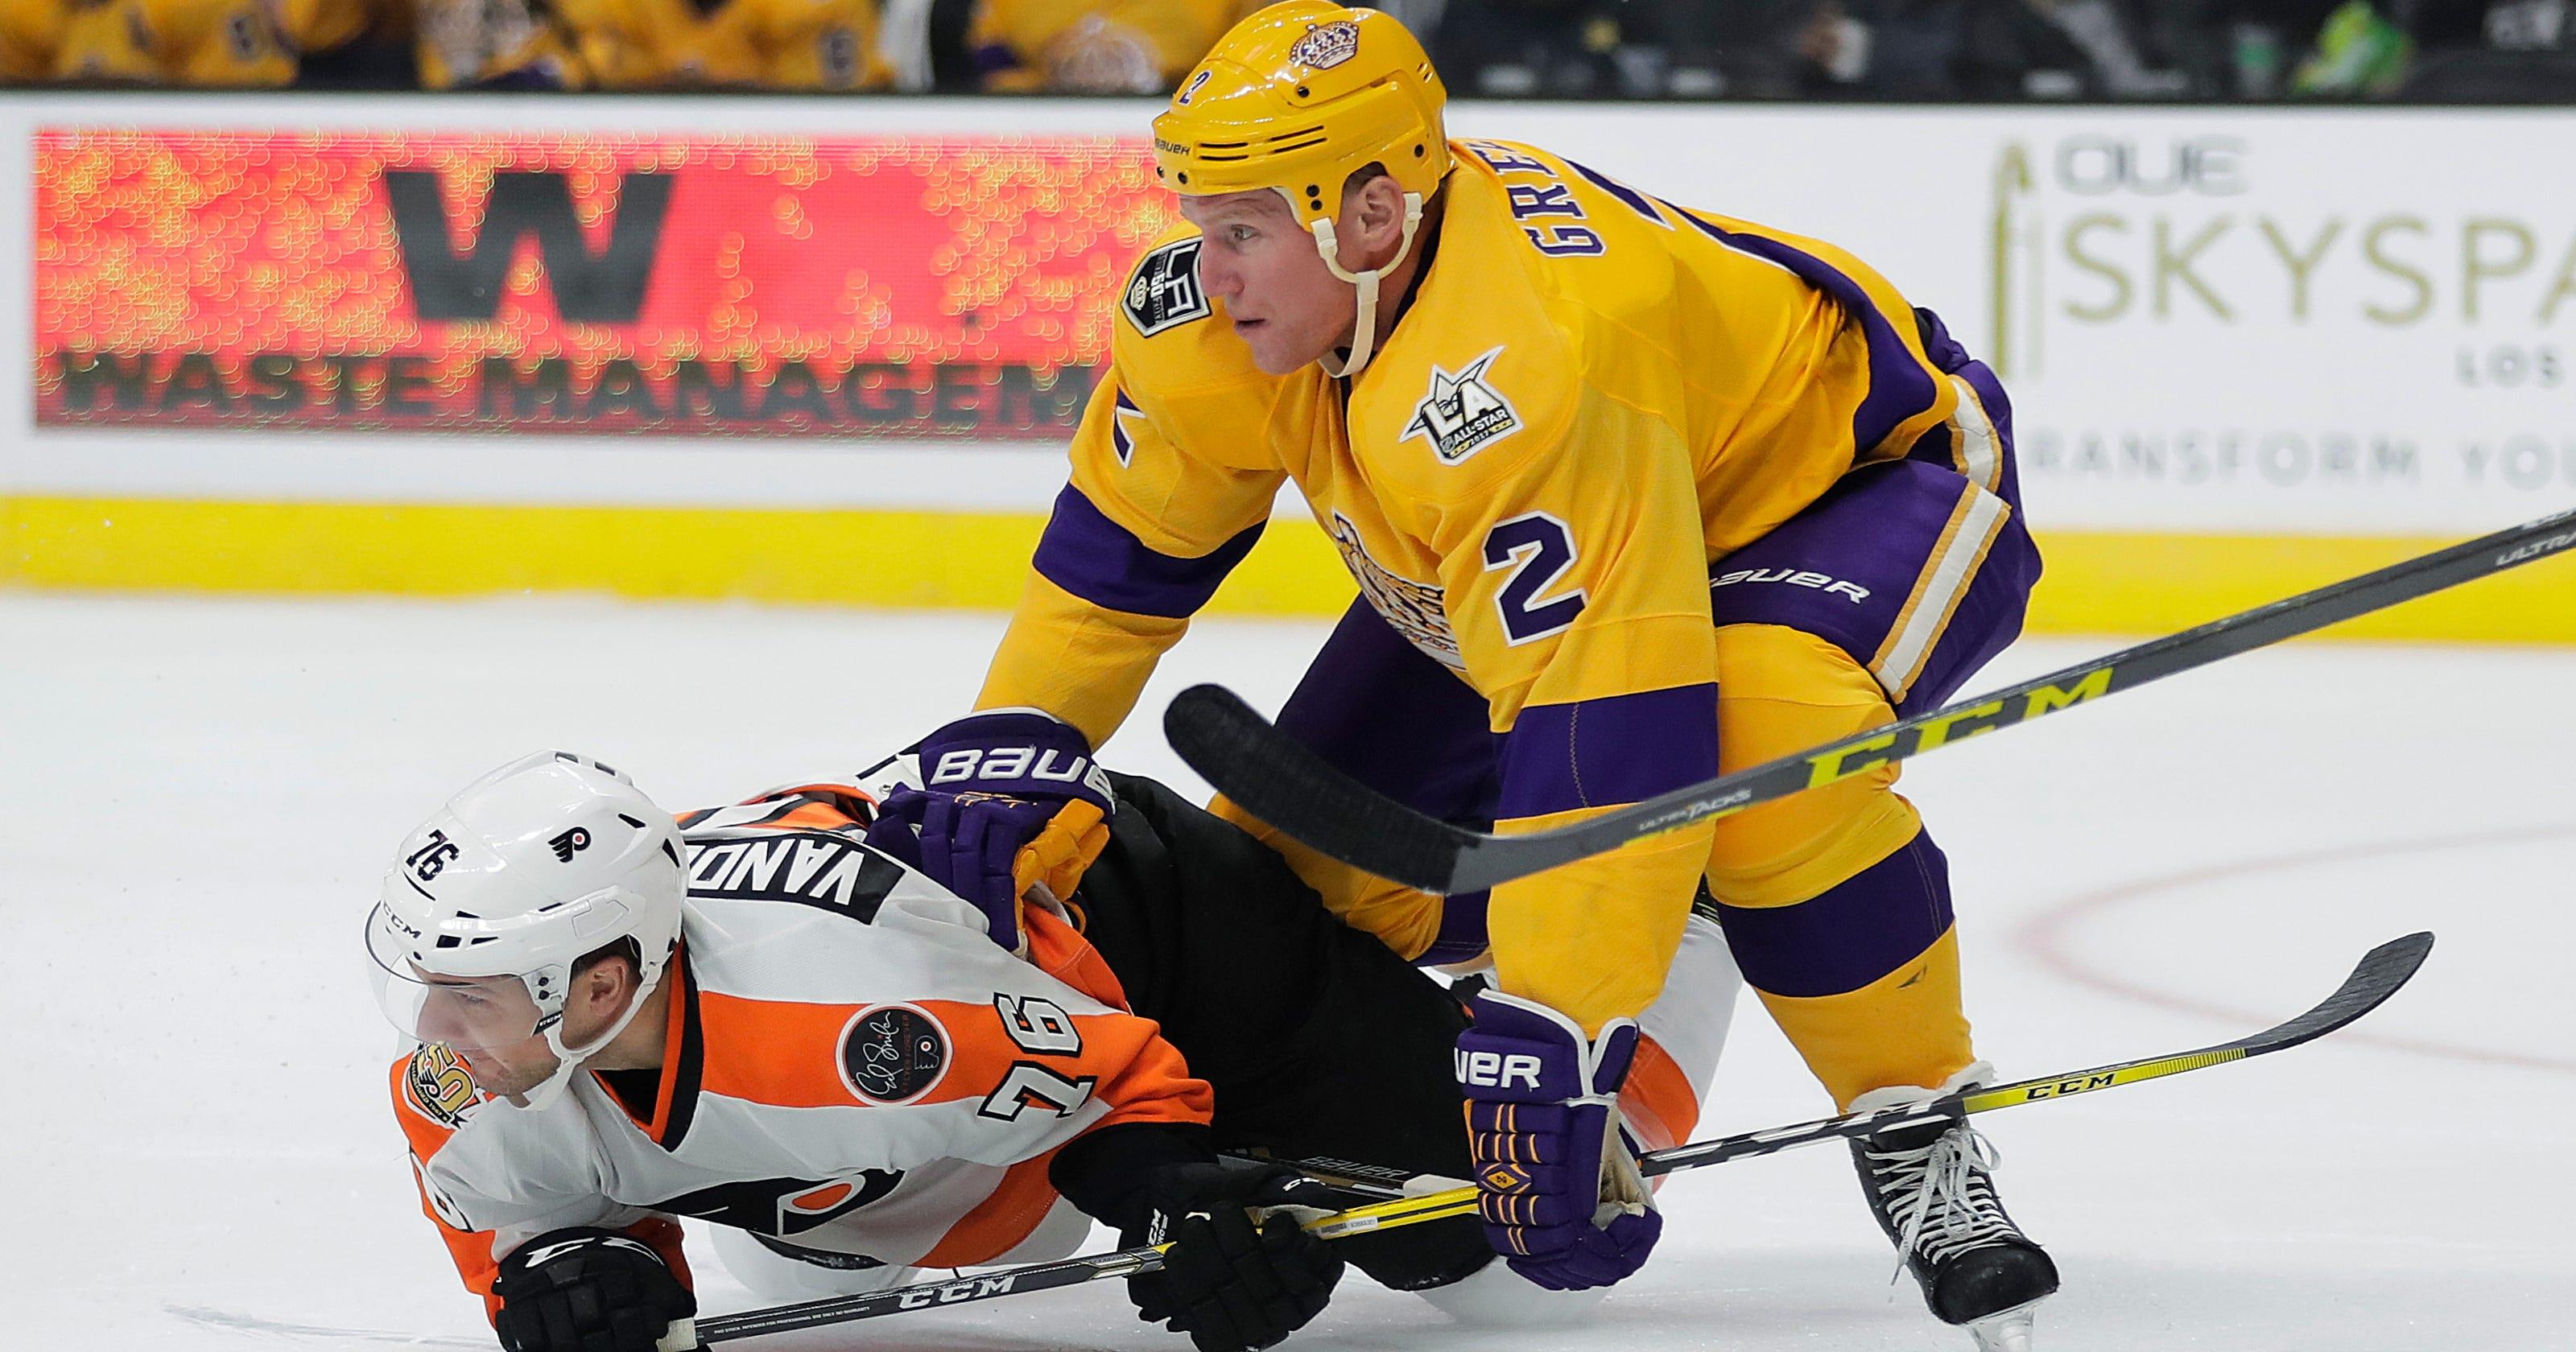 detailed look e54b0 af1b7 Couturier propels Flyers past LA Kings in season opener, 4-2